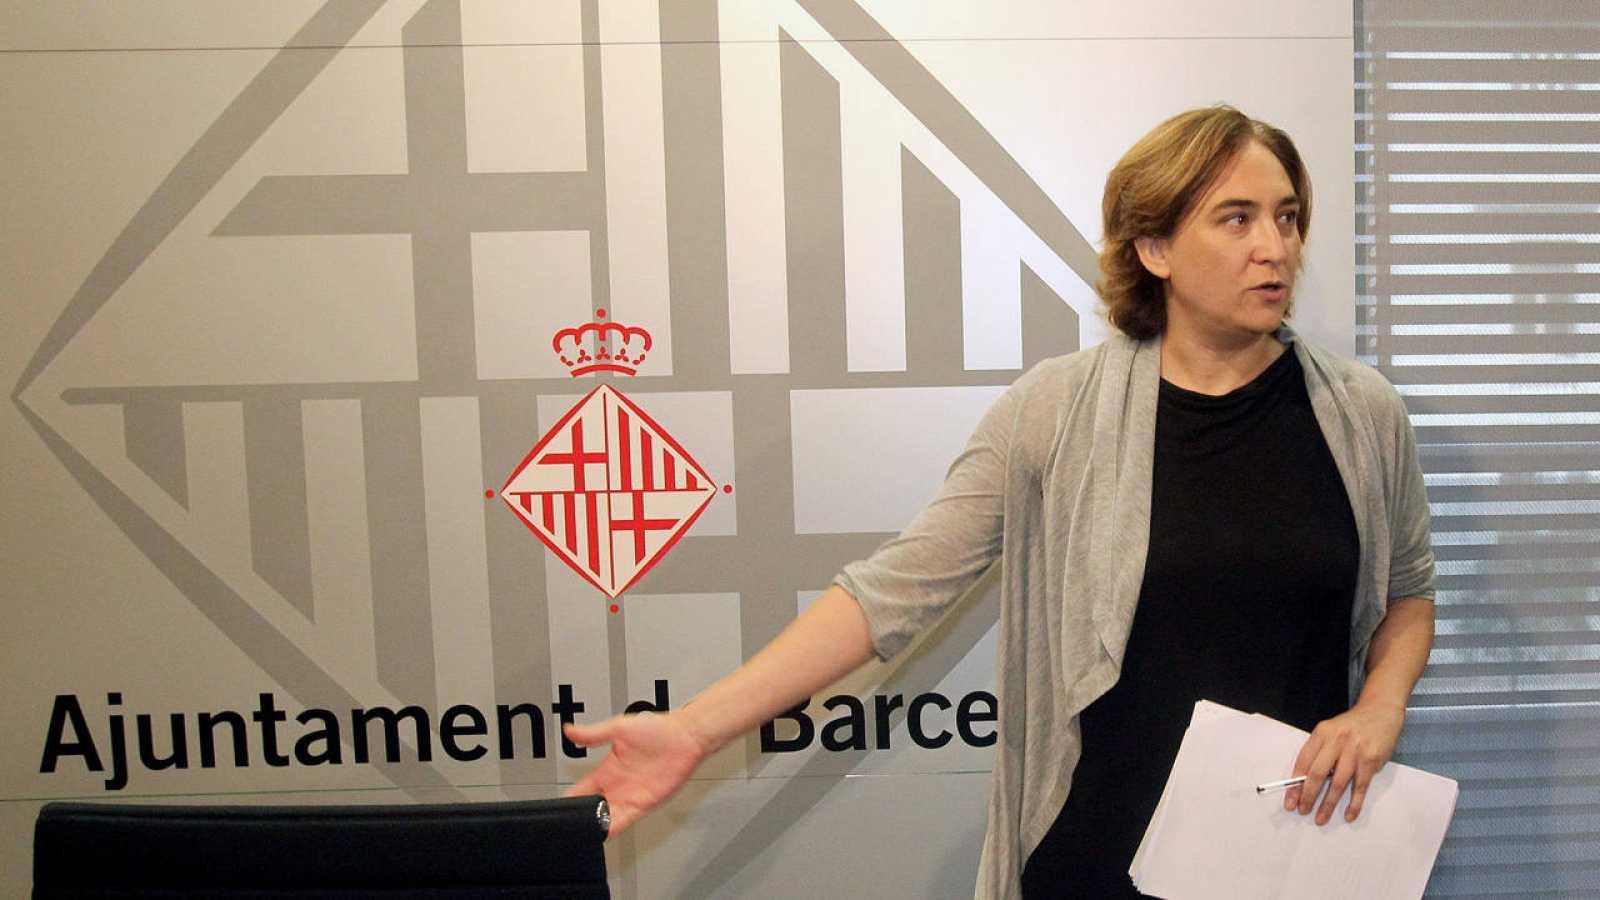 La alcaldesa de Barcelona, Ada Colau, en una rueda de prensa la semana pasada